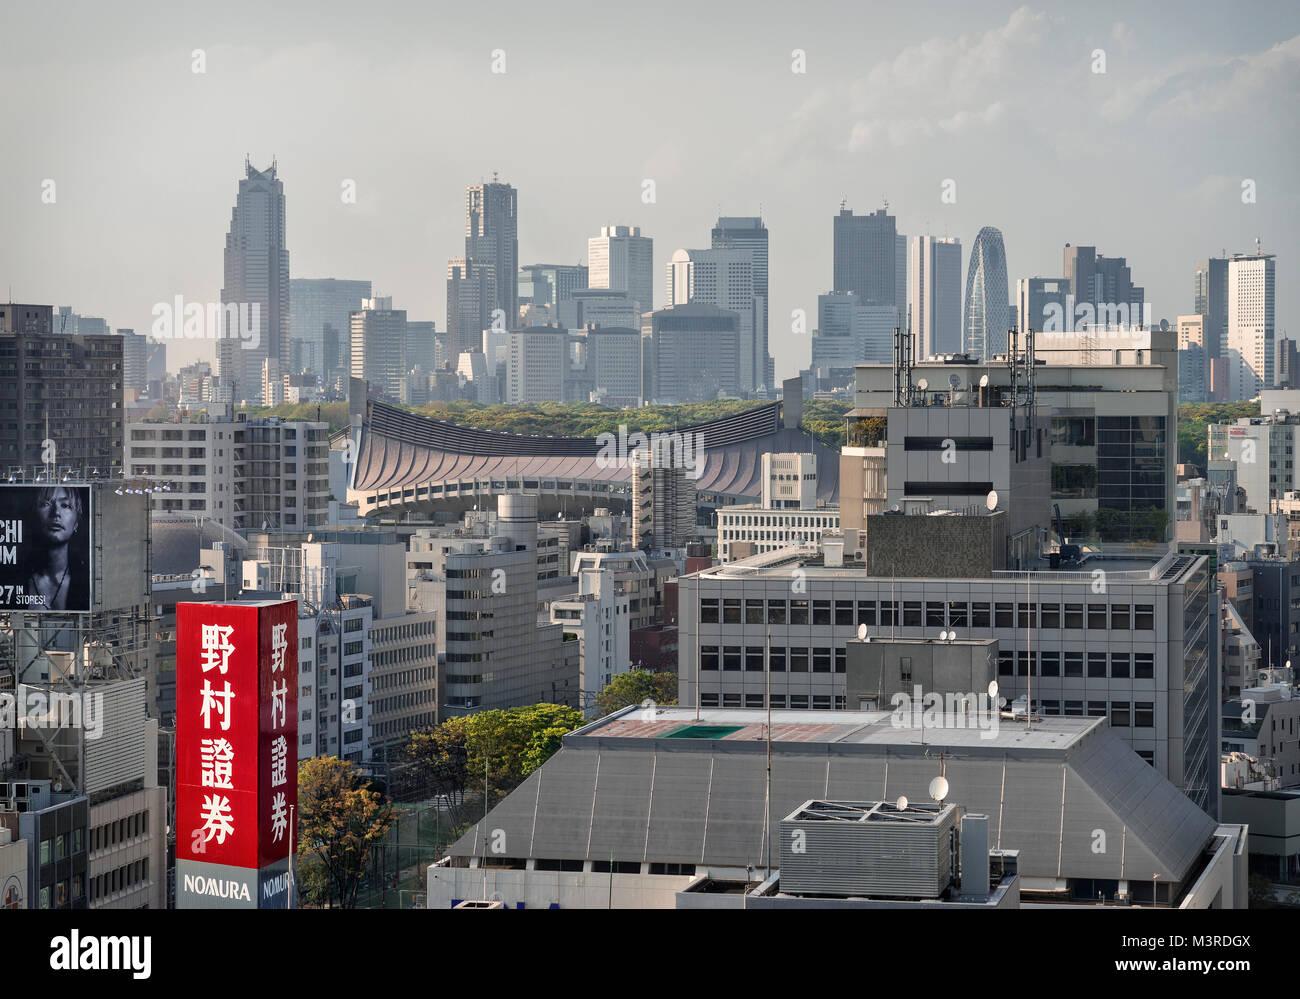 Japan, Honshu island, Kanto, Tokyo, the skyline toward Shinjuku. - Stock Image